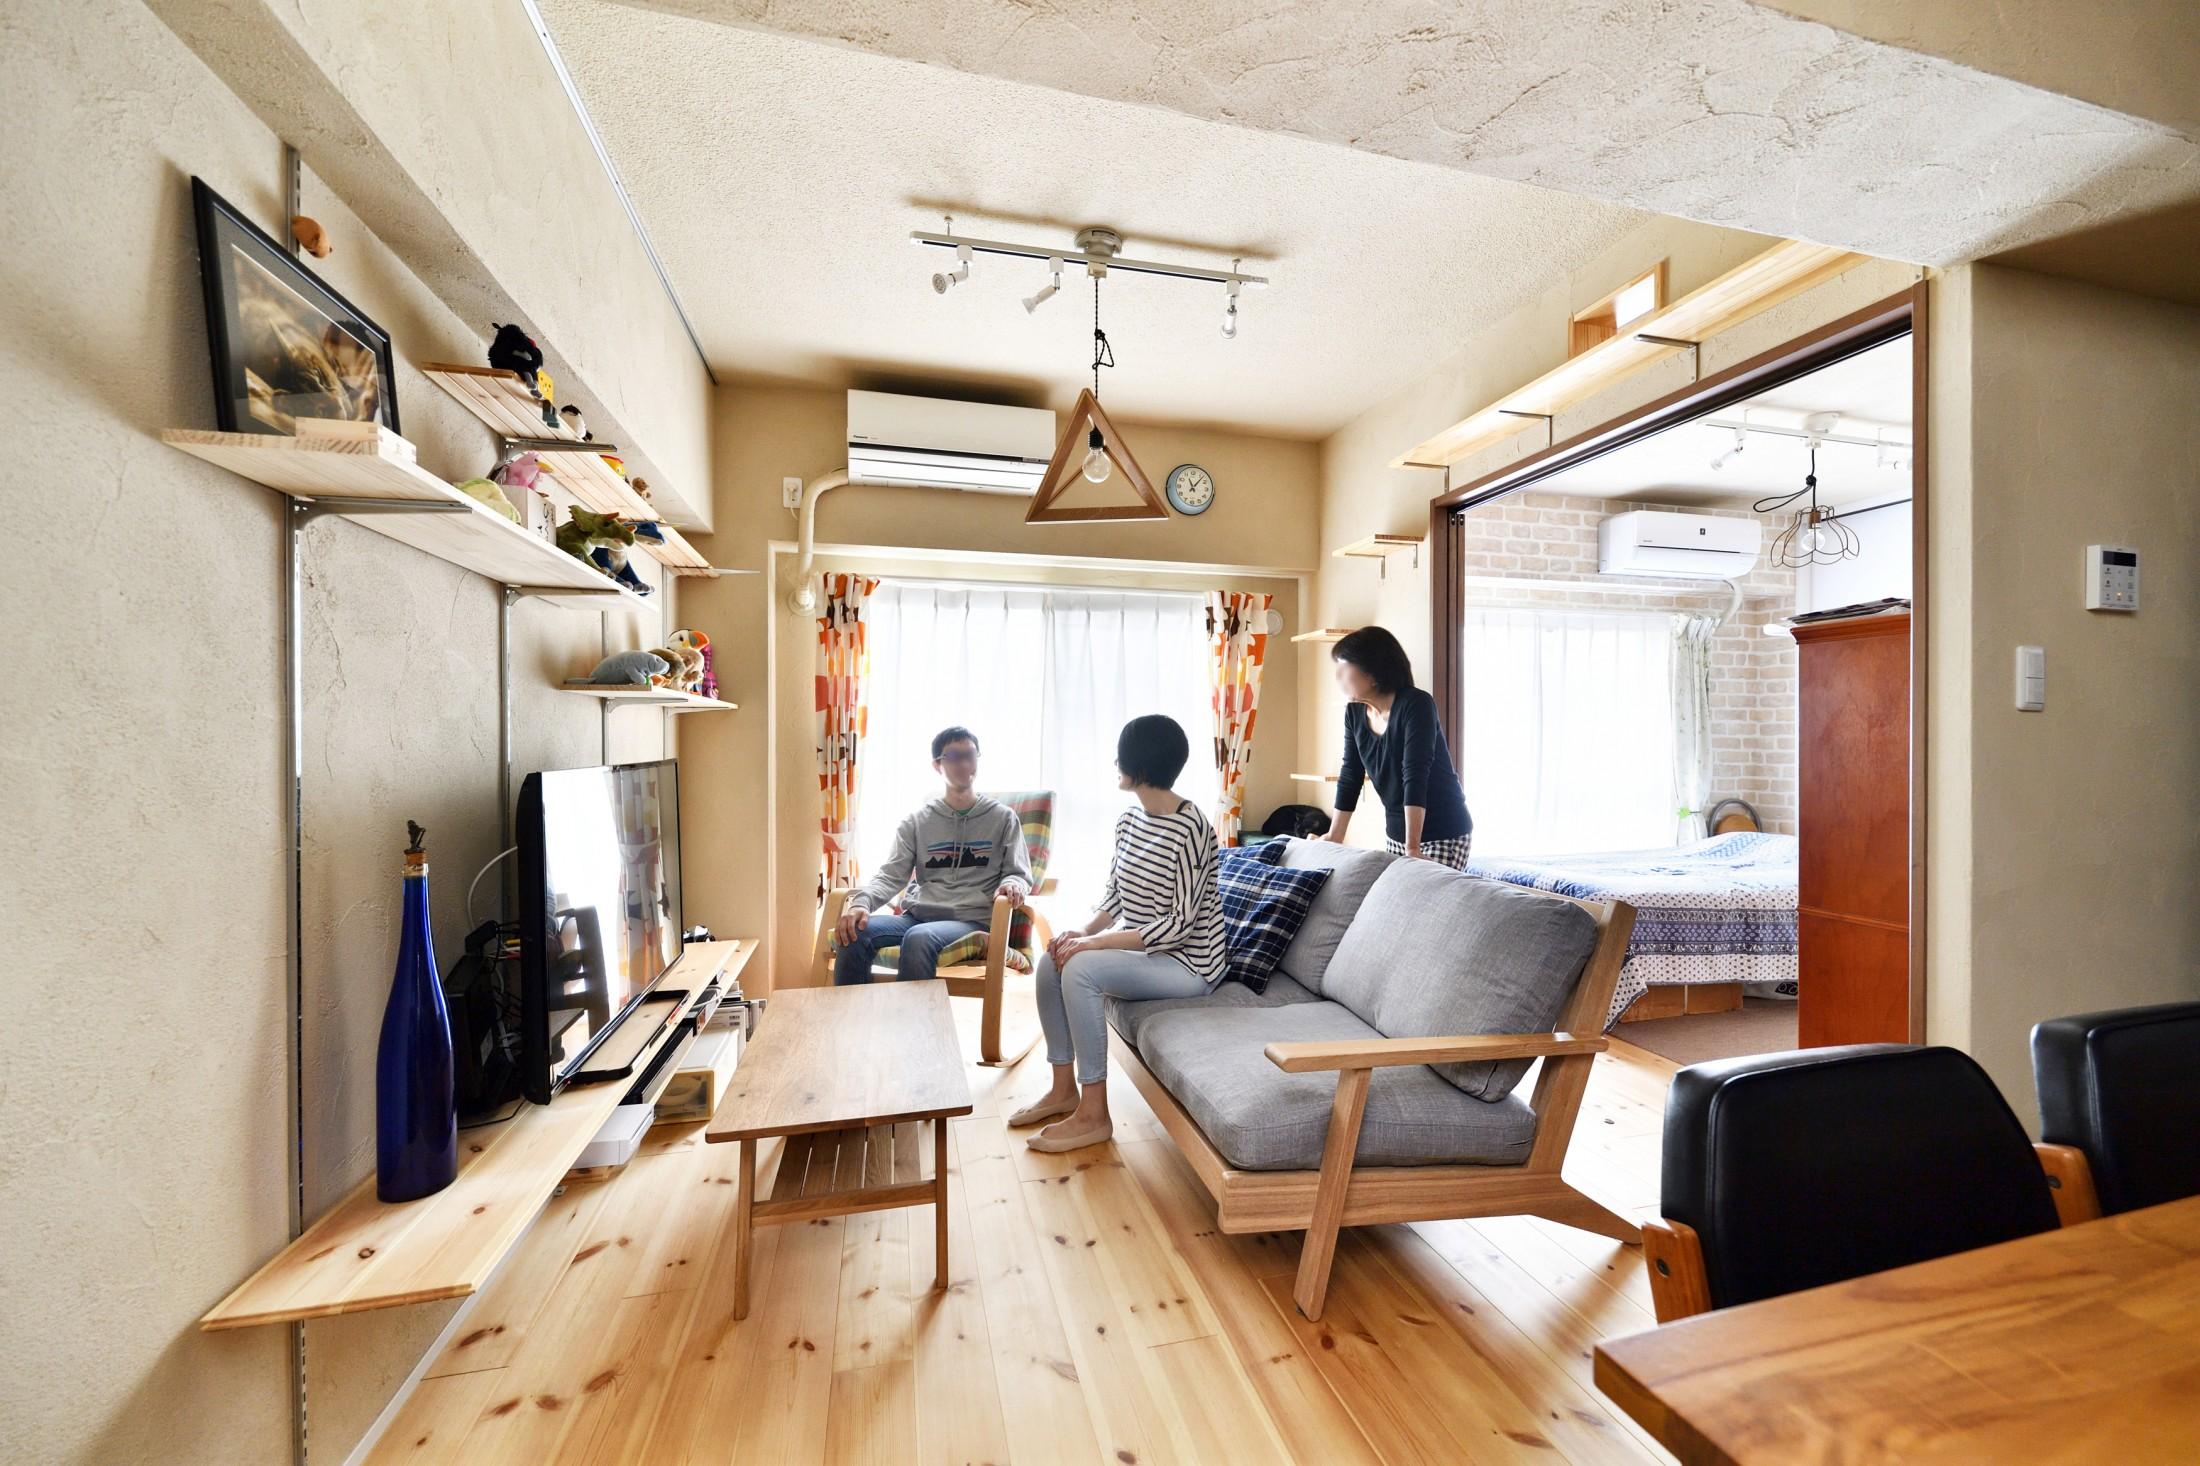 WEB「リノベりす」に横浜市の施工事例・H様邸が紹介されました。